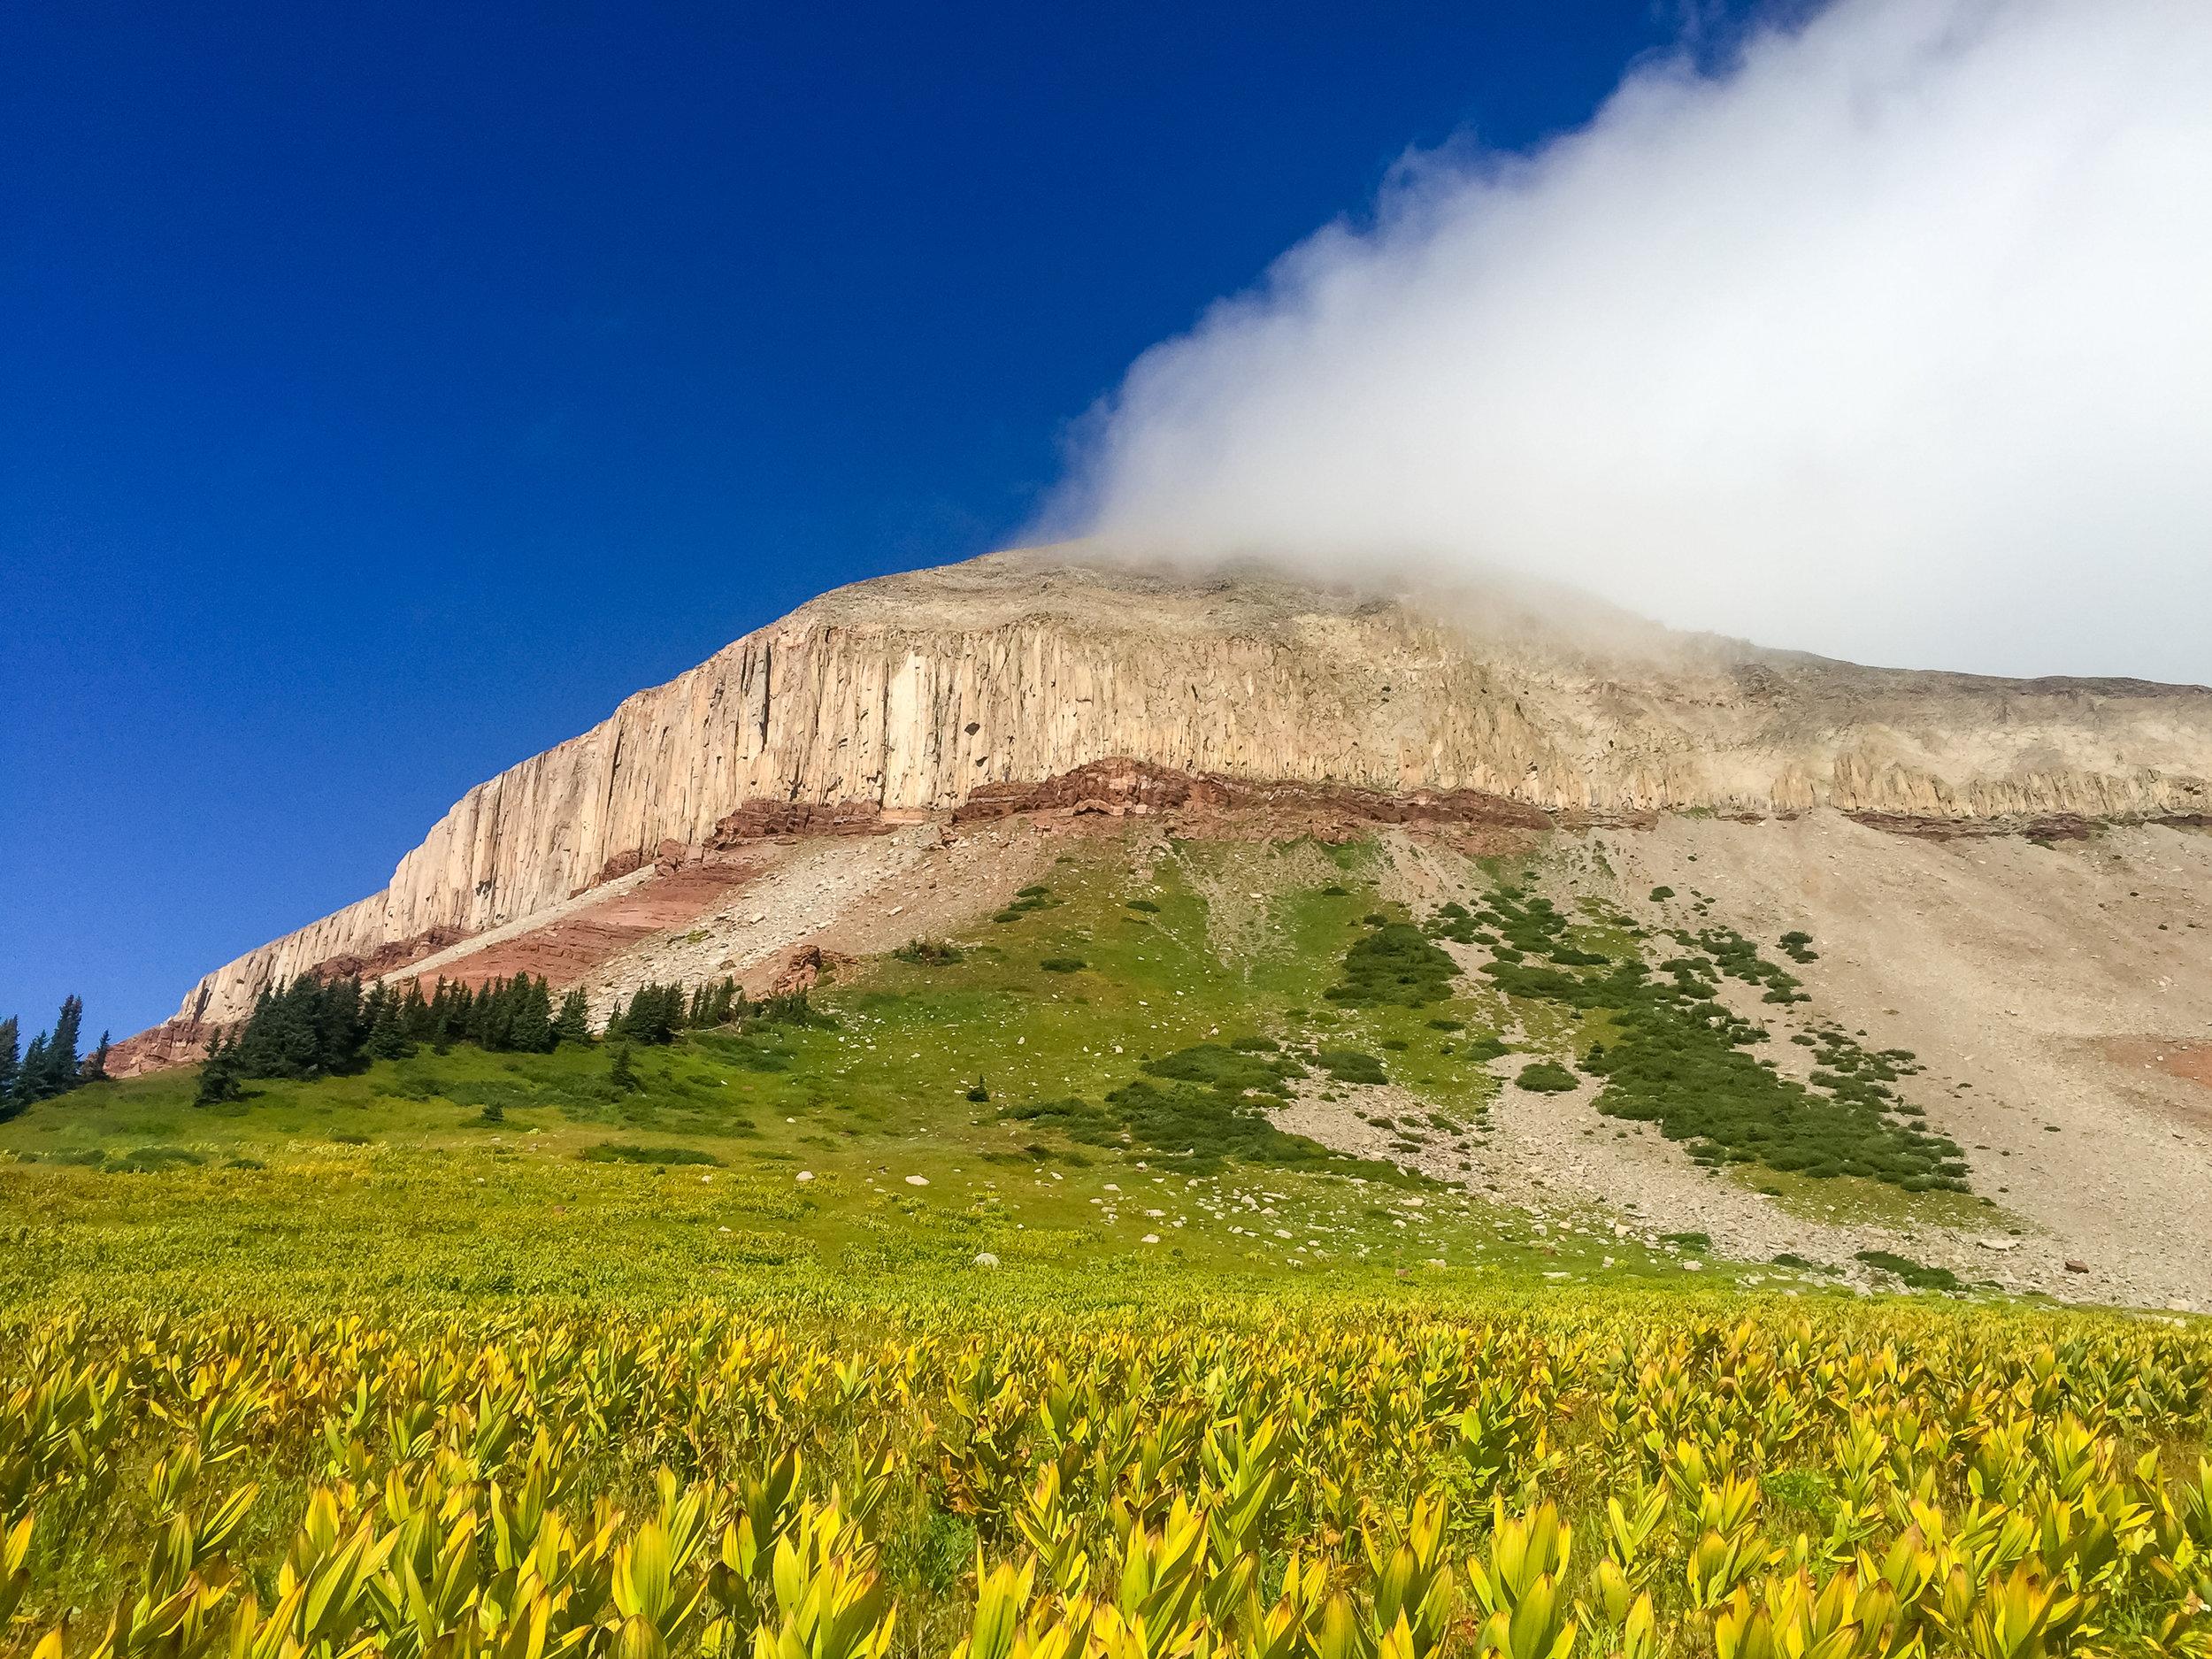 Engineer Mountain looks like it is smoking